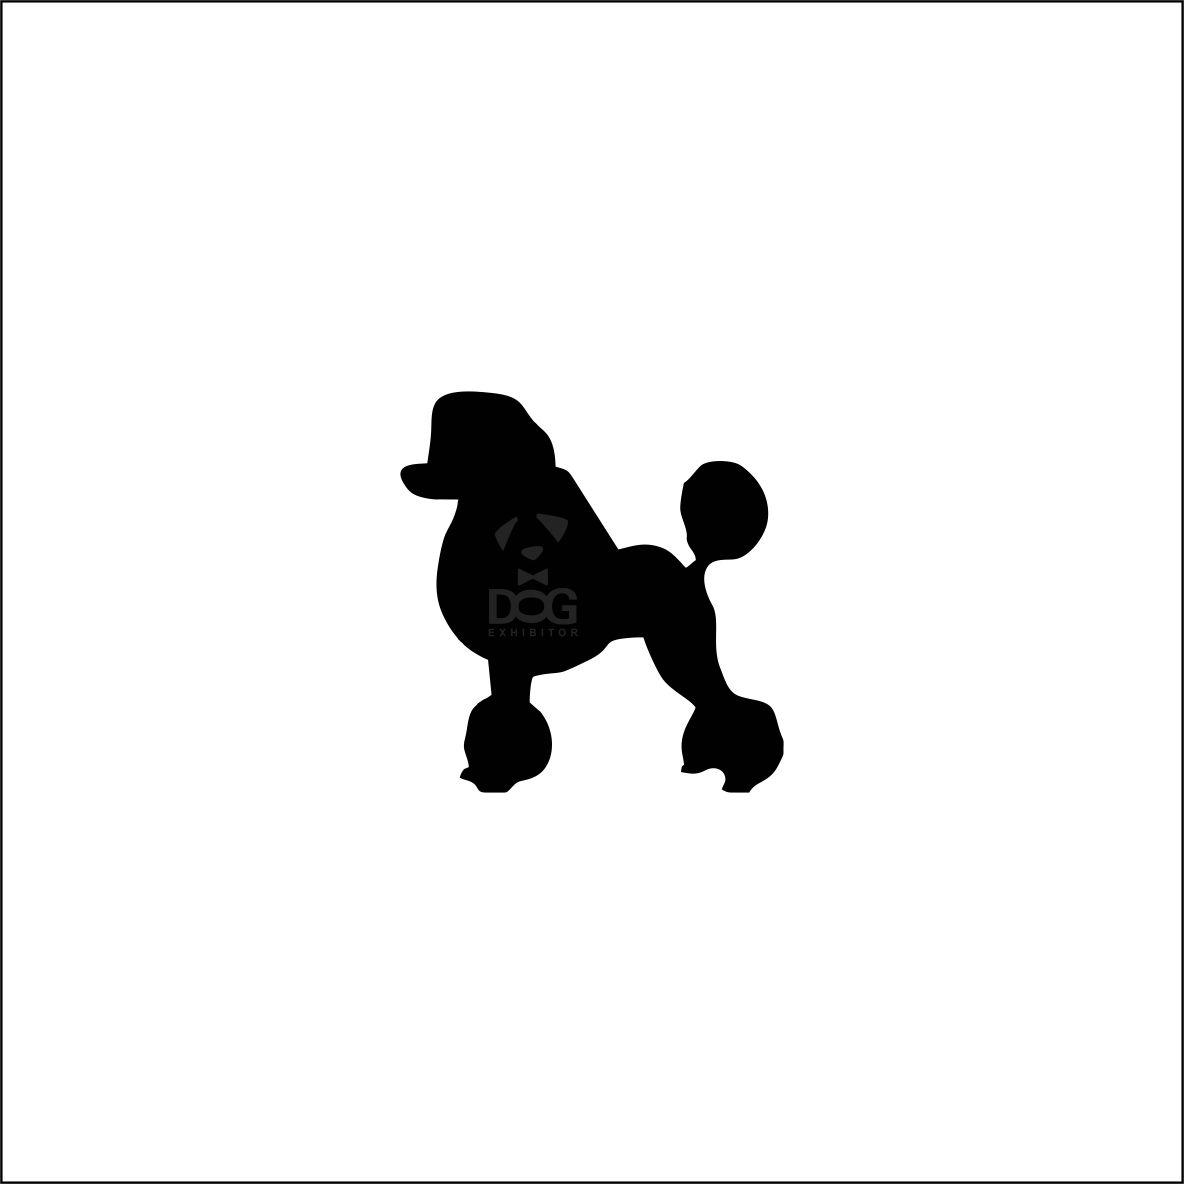 1184x1184 Poodle Silhouette Sticker